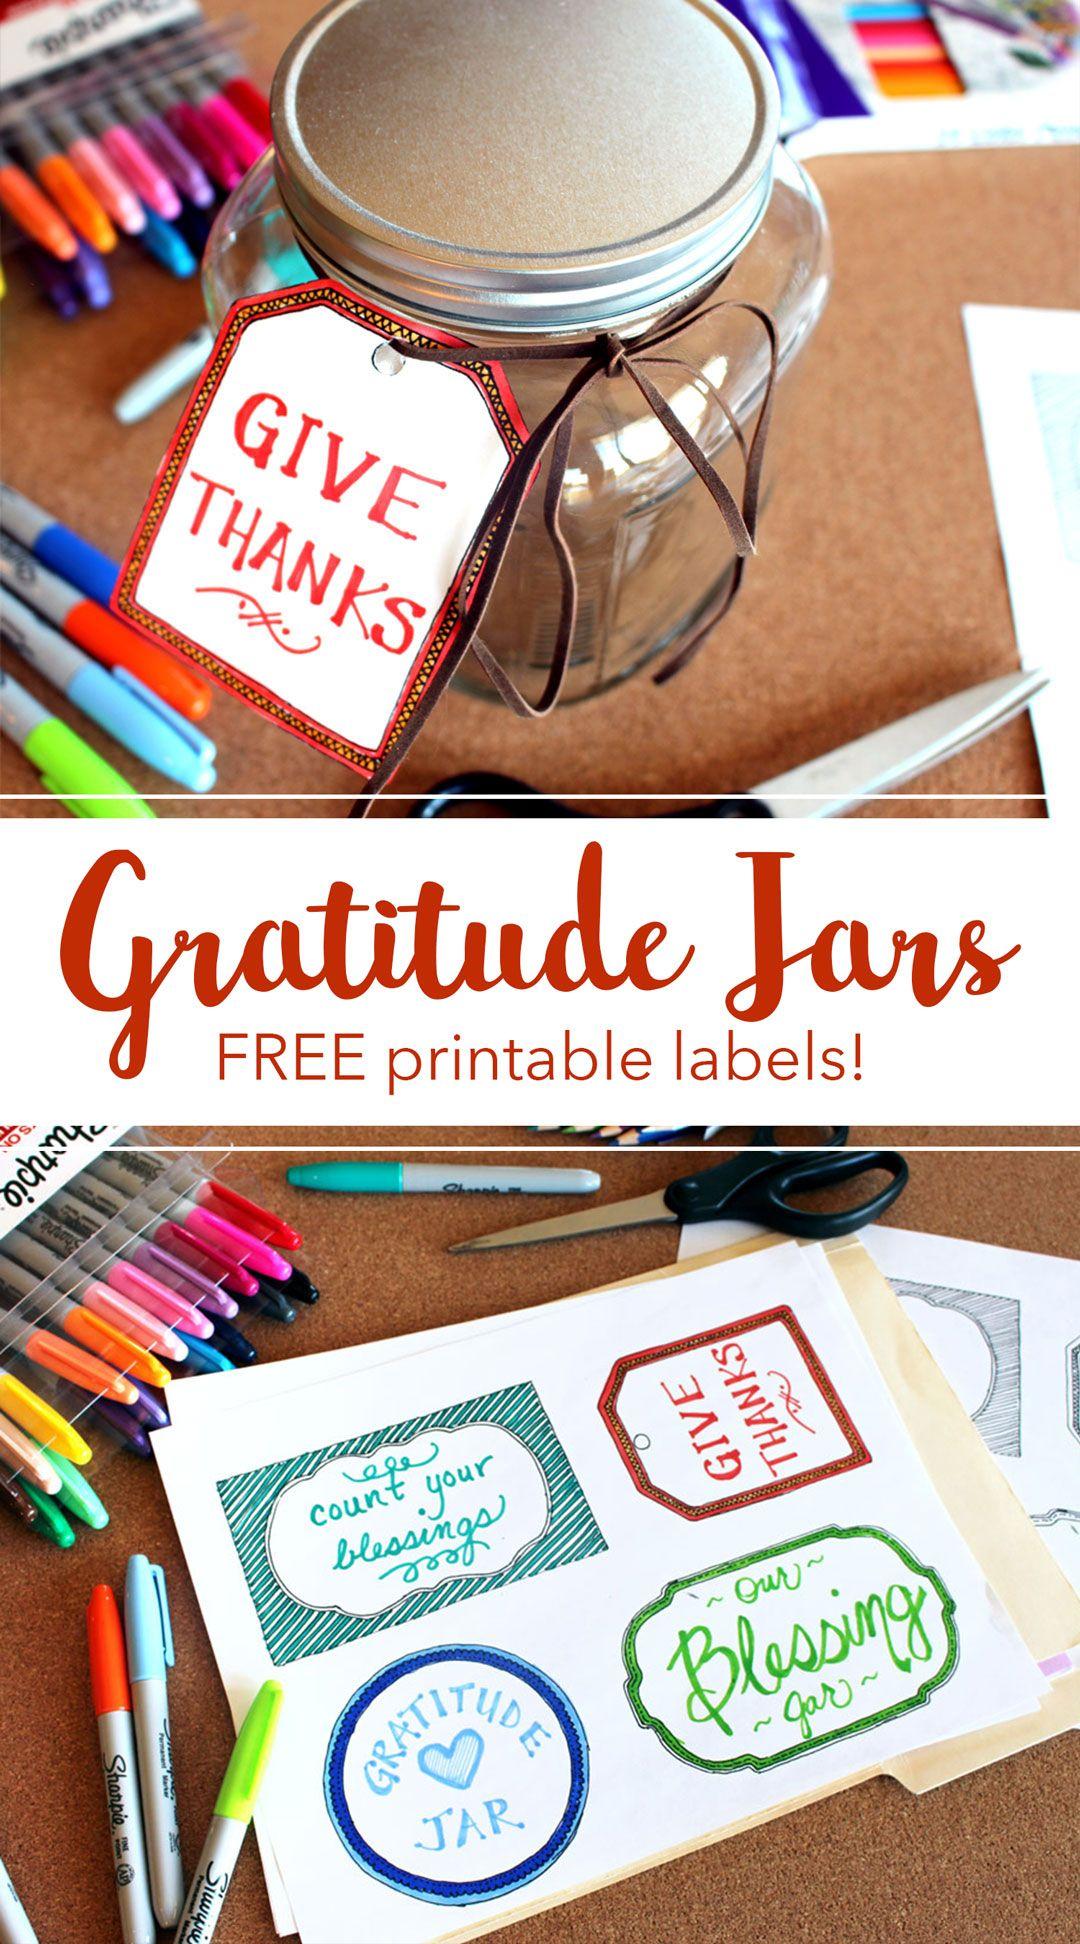 Make A Count Your Blessings Gratitude Jar For November Welcome To Nana S Recipe Gratitude Jar Blessings Jar Happy Jar